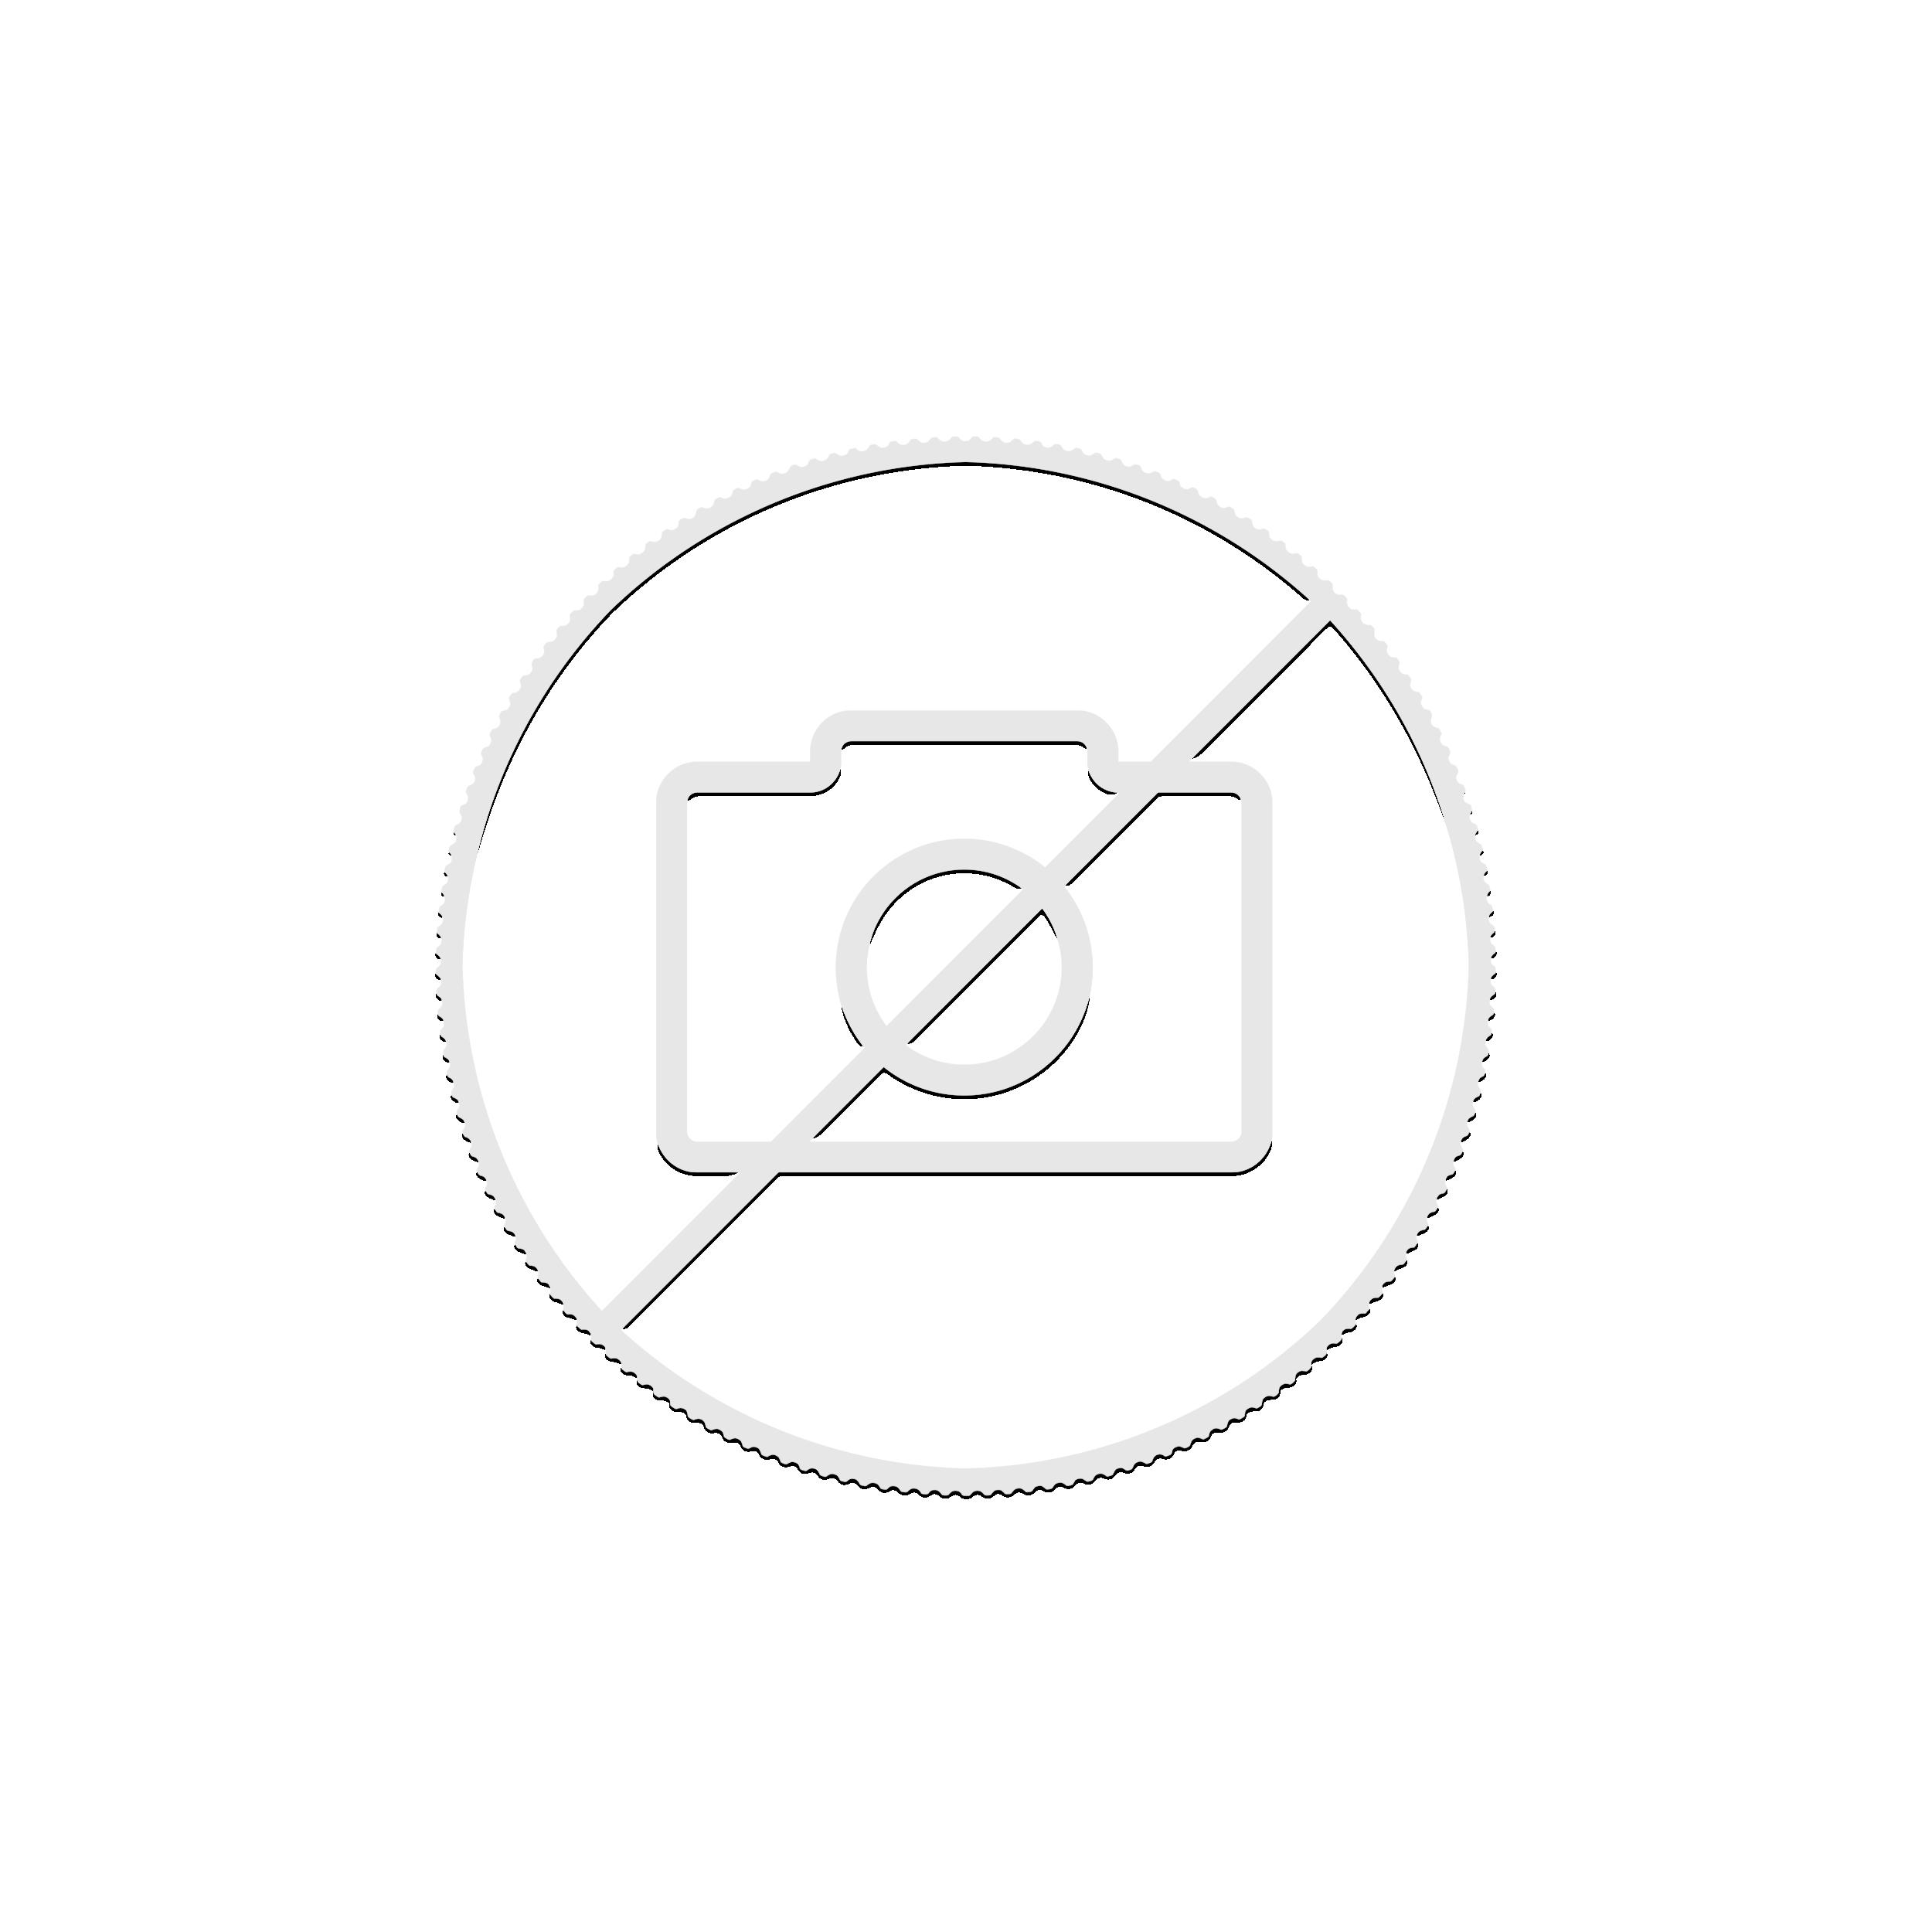 1 Kilogram silver coin Lunar 2020 reverse